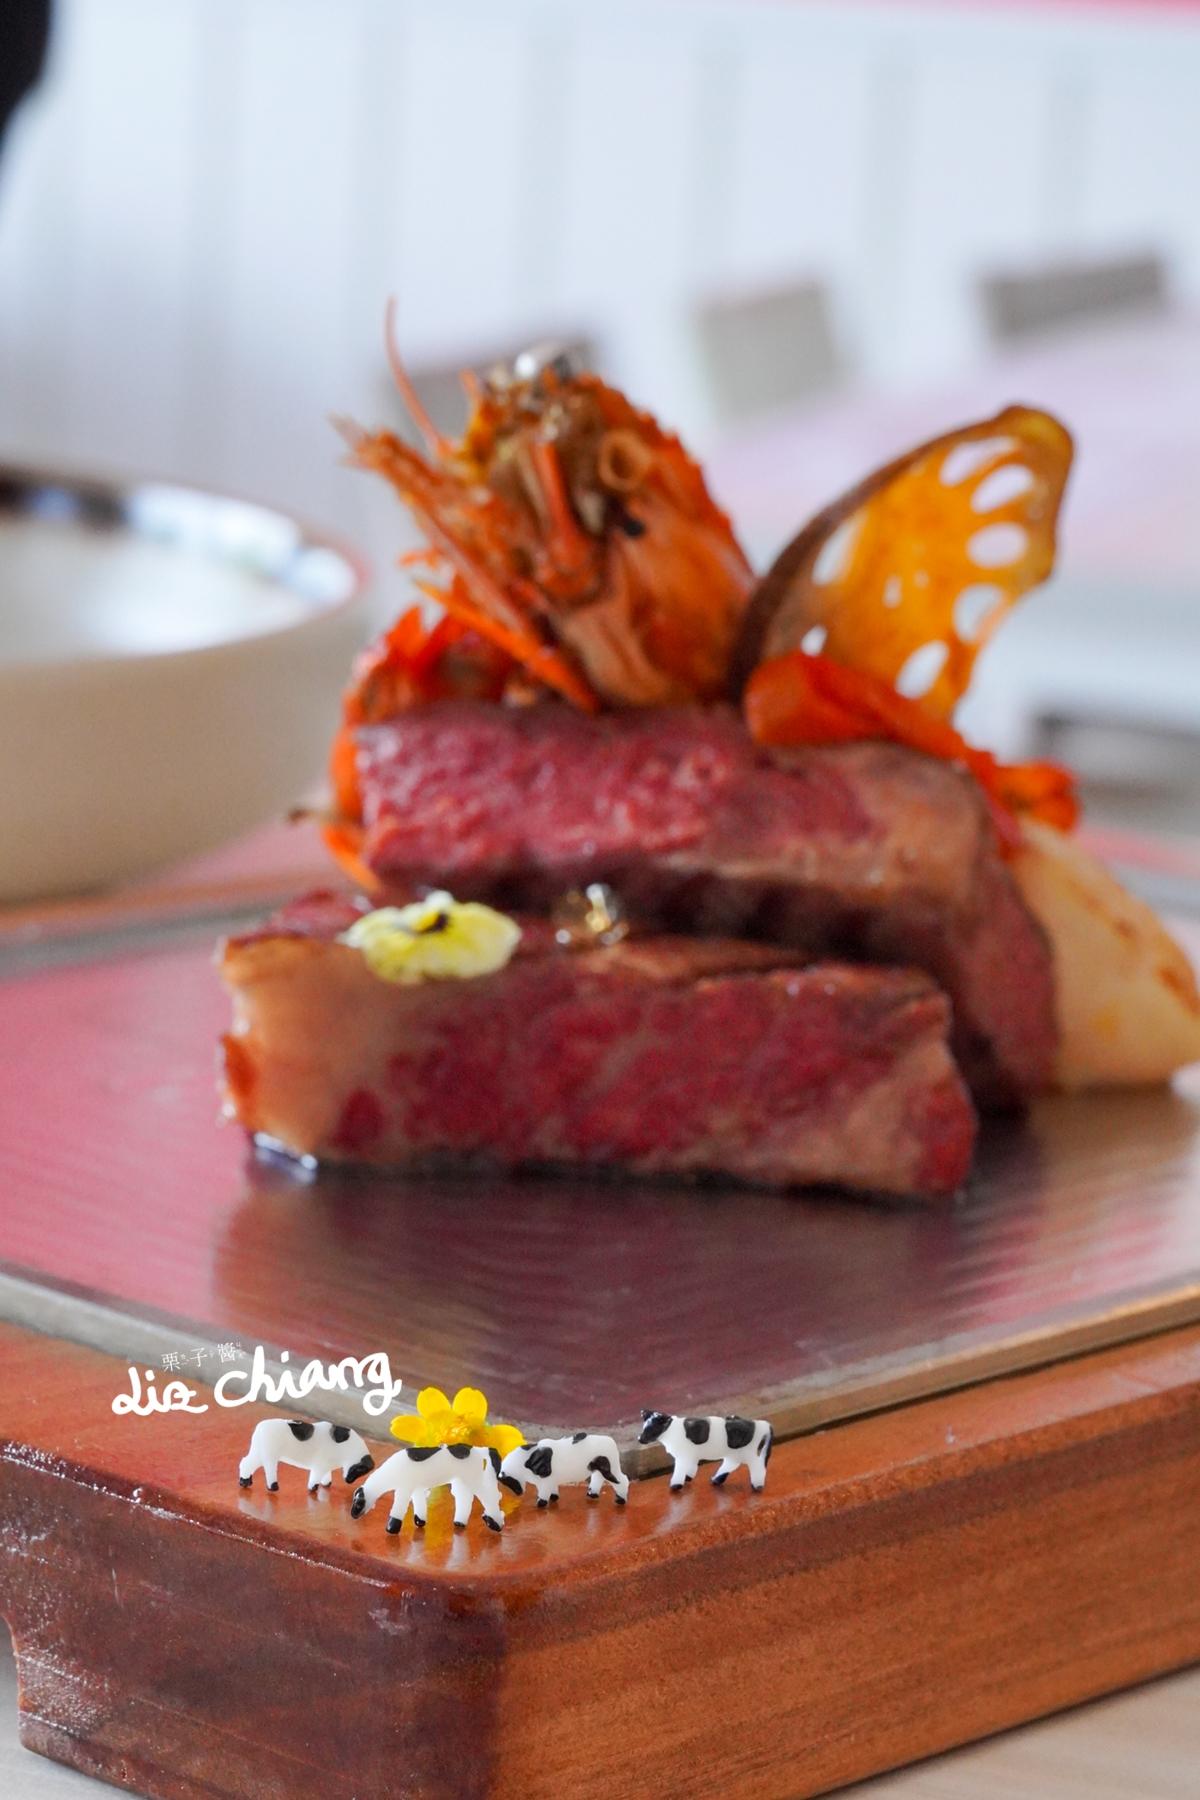 DSC06958Liz chiang 栗子醬-美食部落客-料理部落客